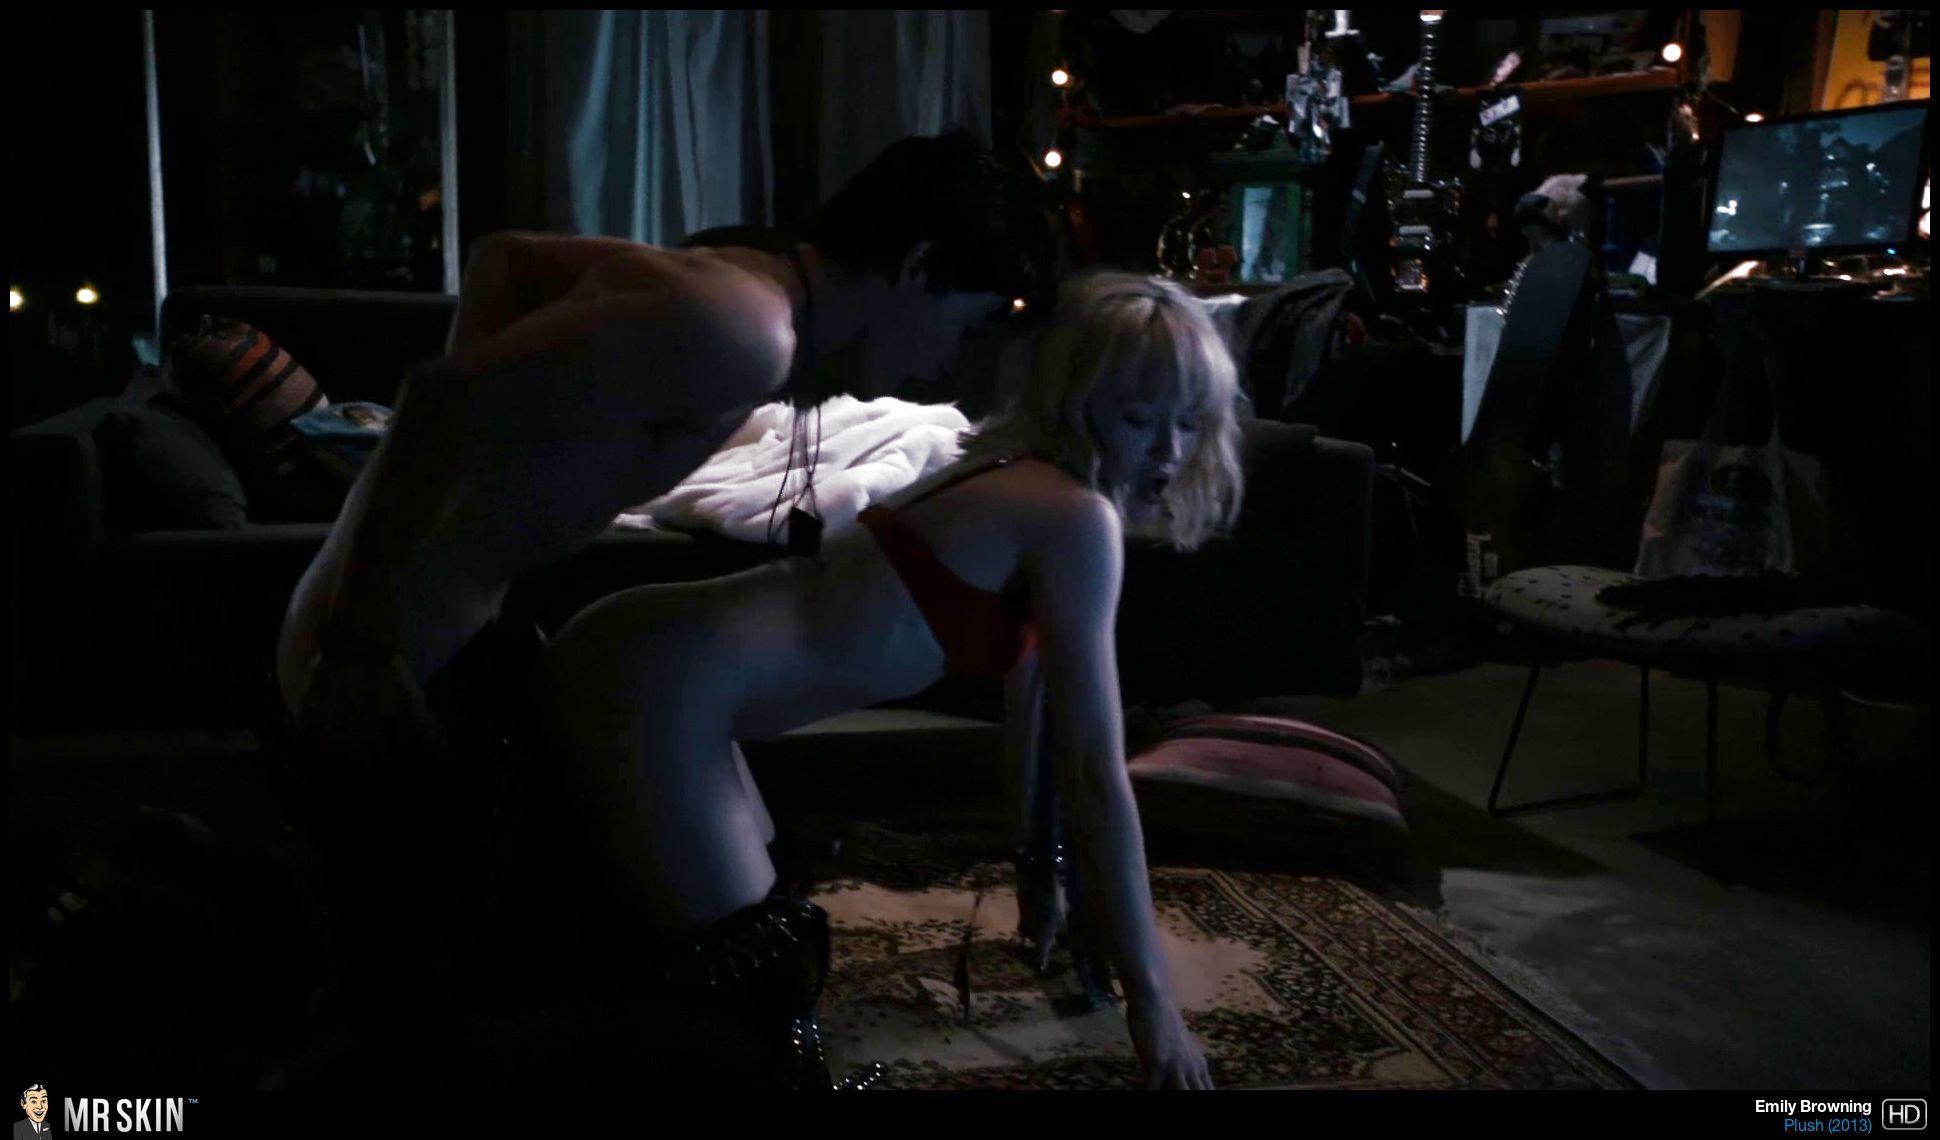 emili-brauning-porno-foto